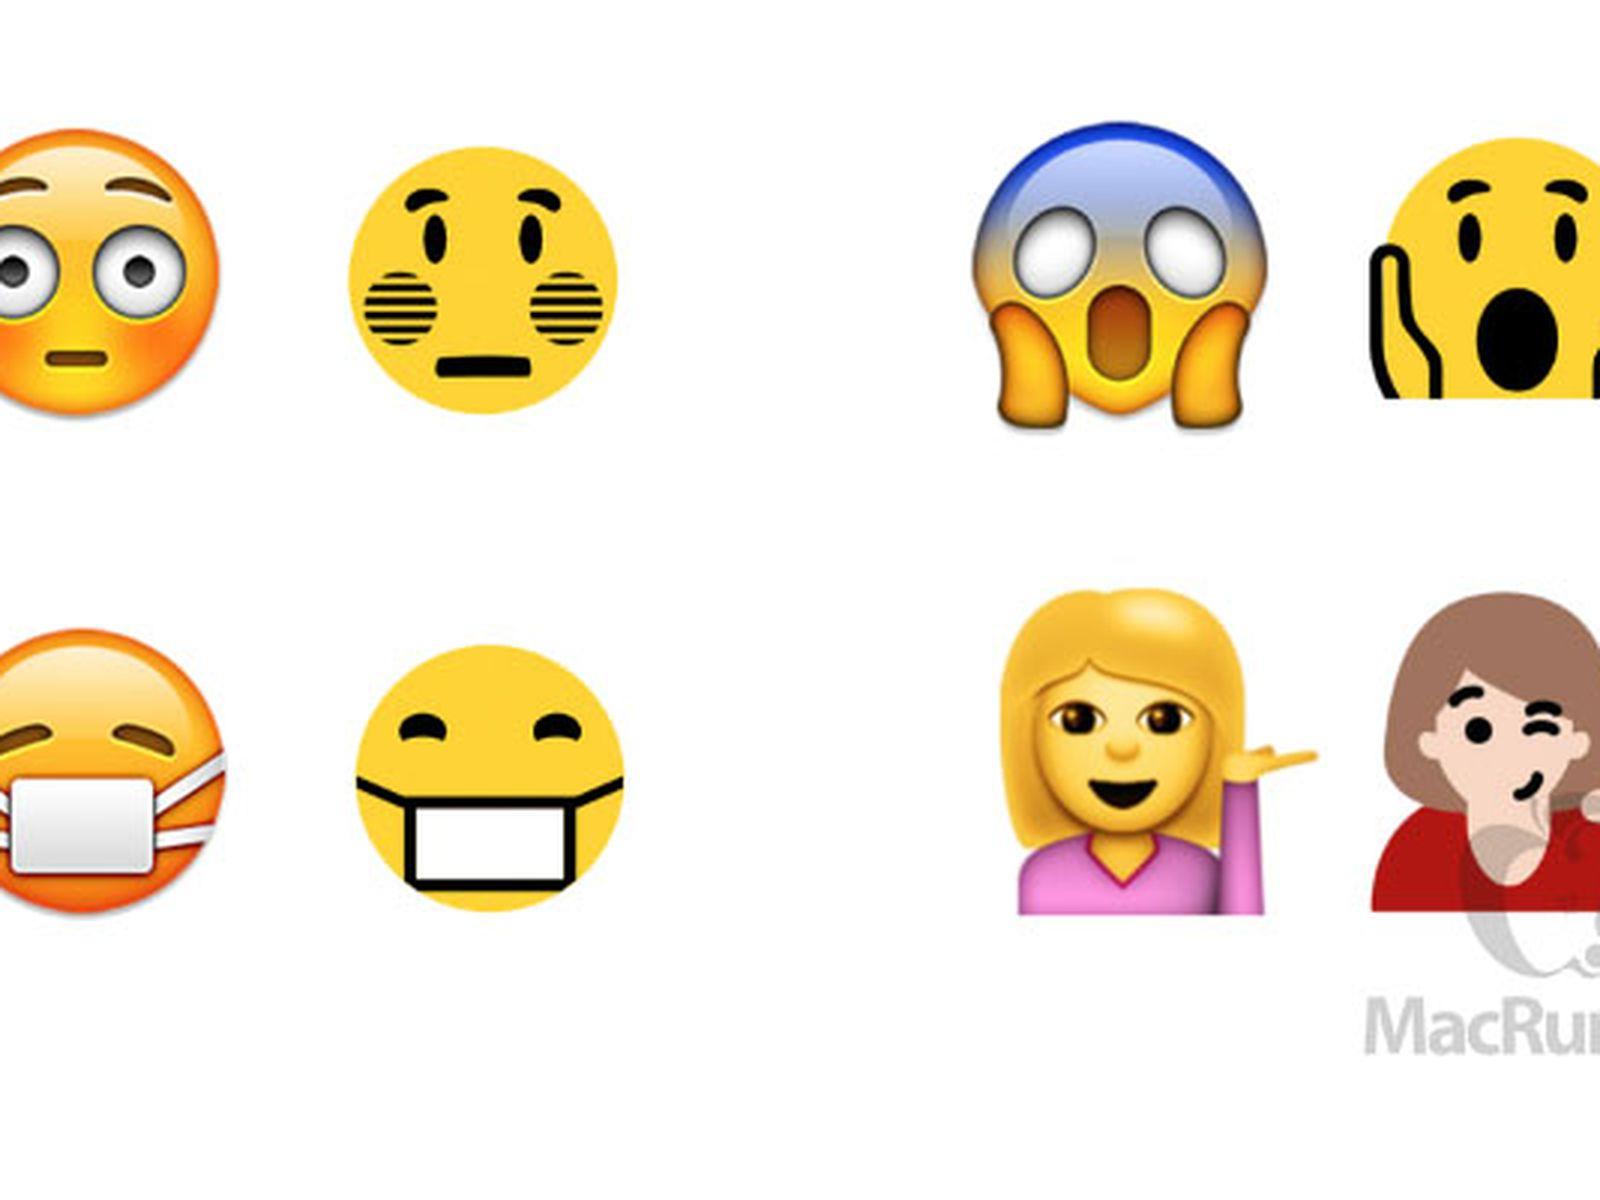 Microsoft Updates Windows 10 Emoji To Resemble Apple S Collection Macrumors